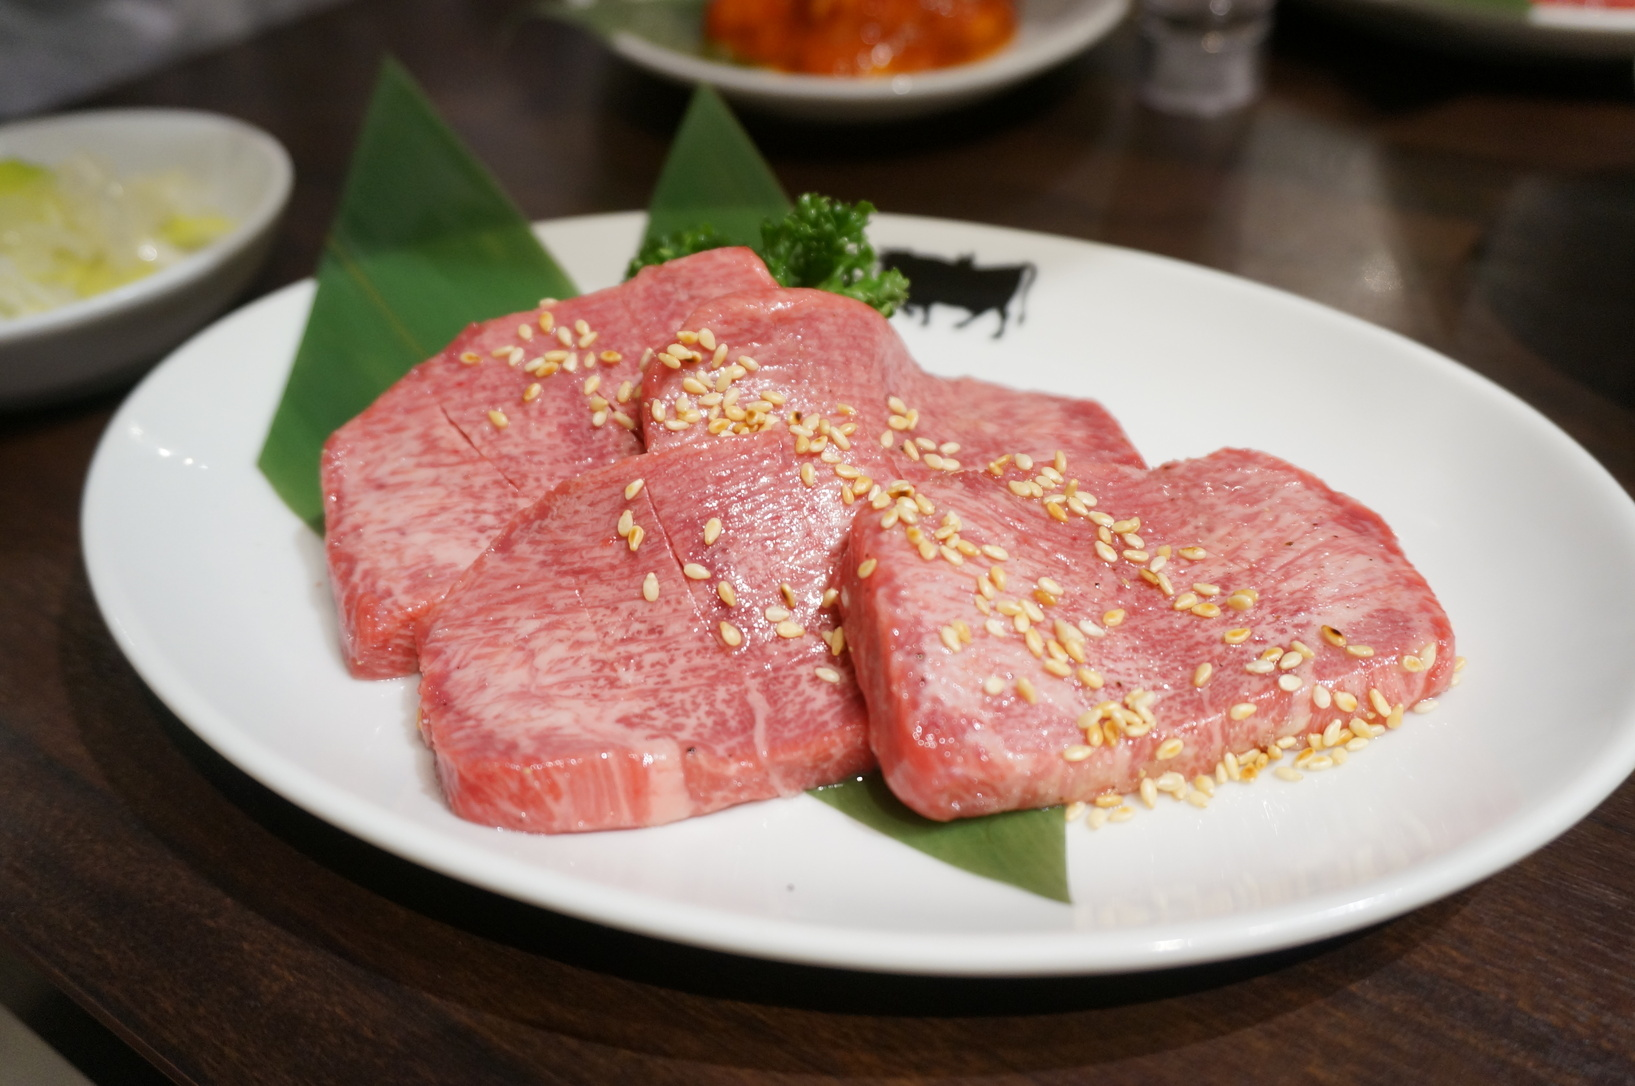 宇都宮高級焼肉:焼肉グレート 駅前店